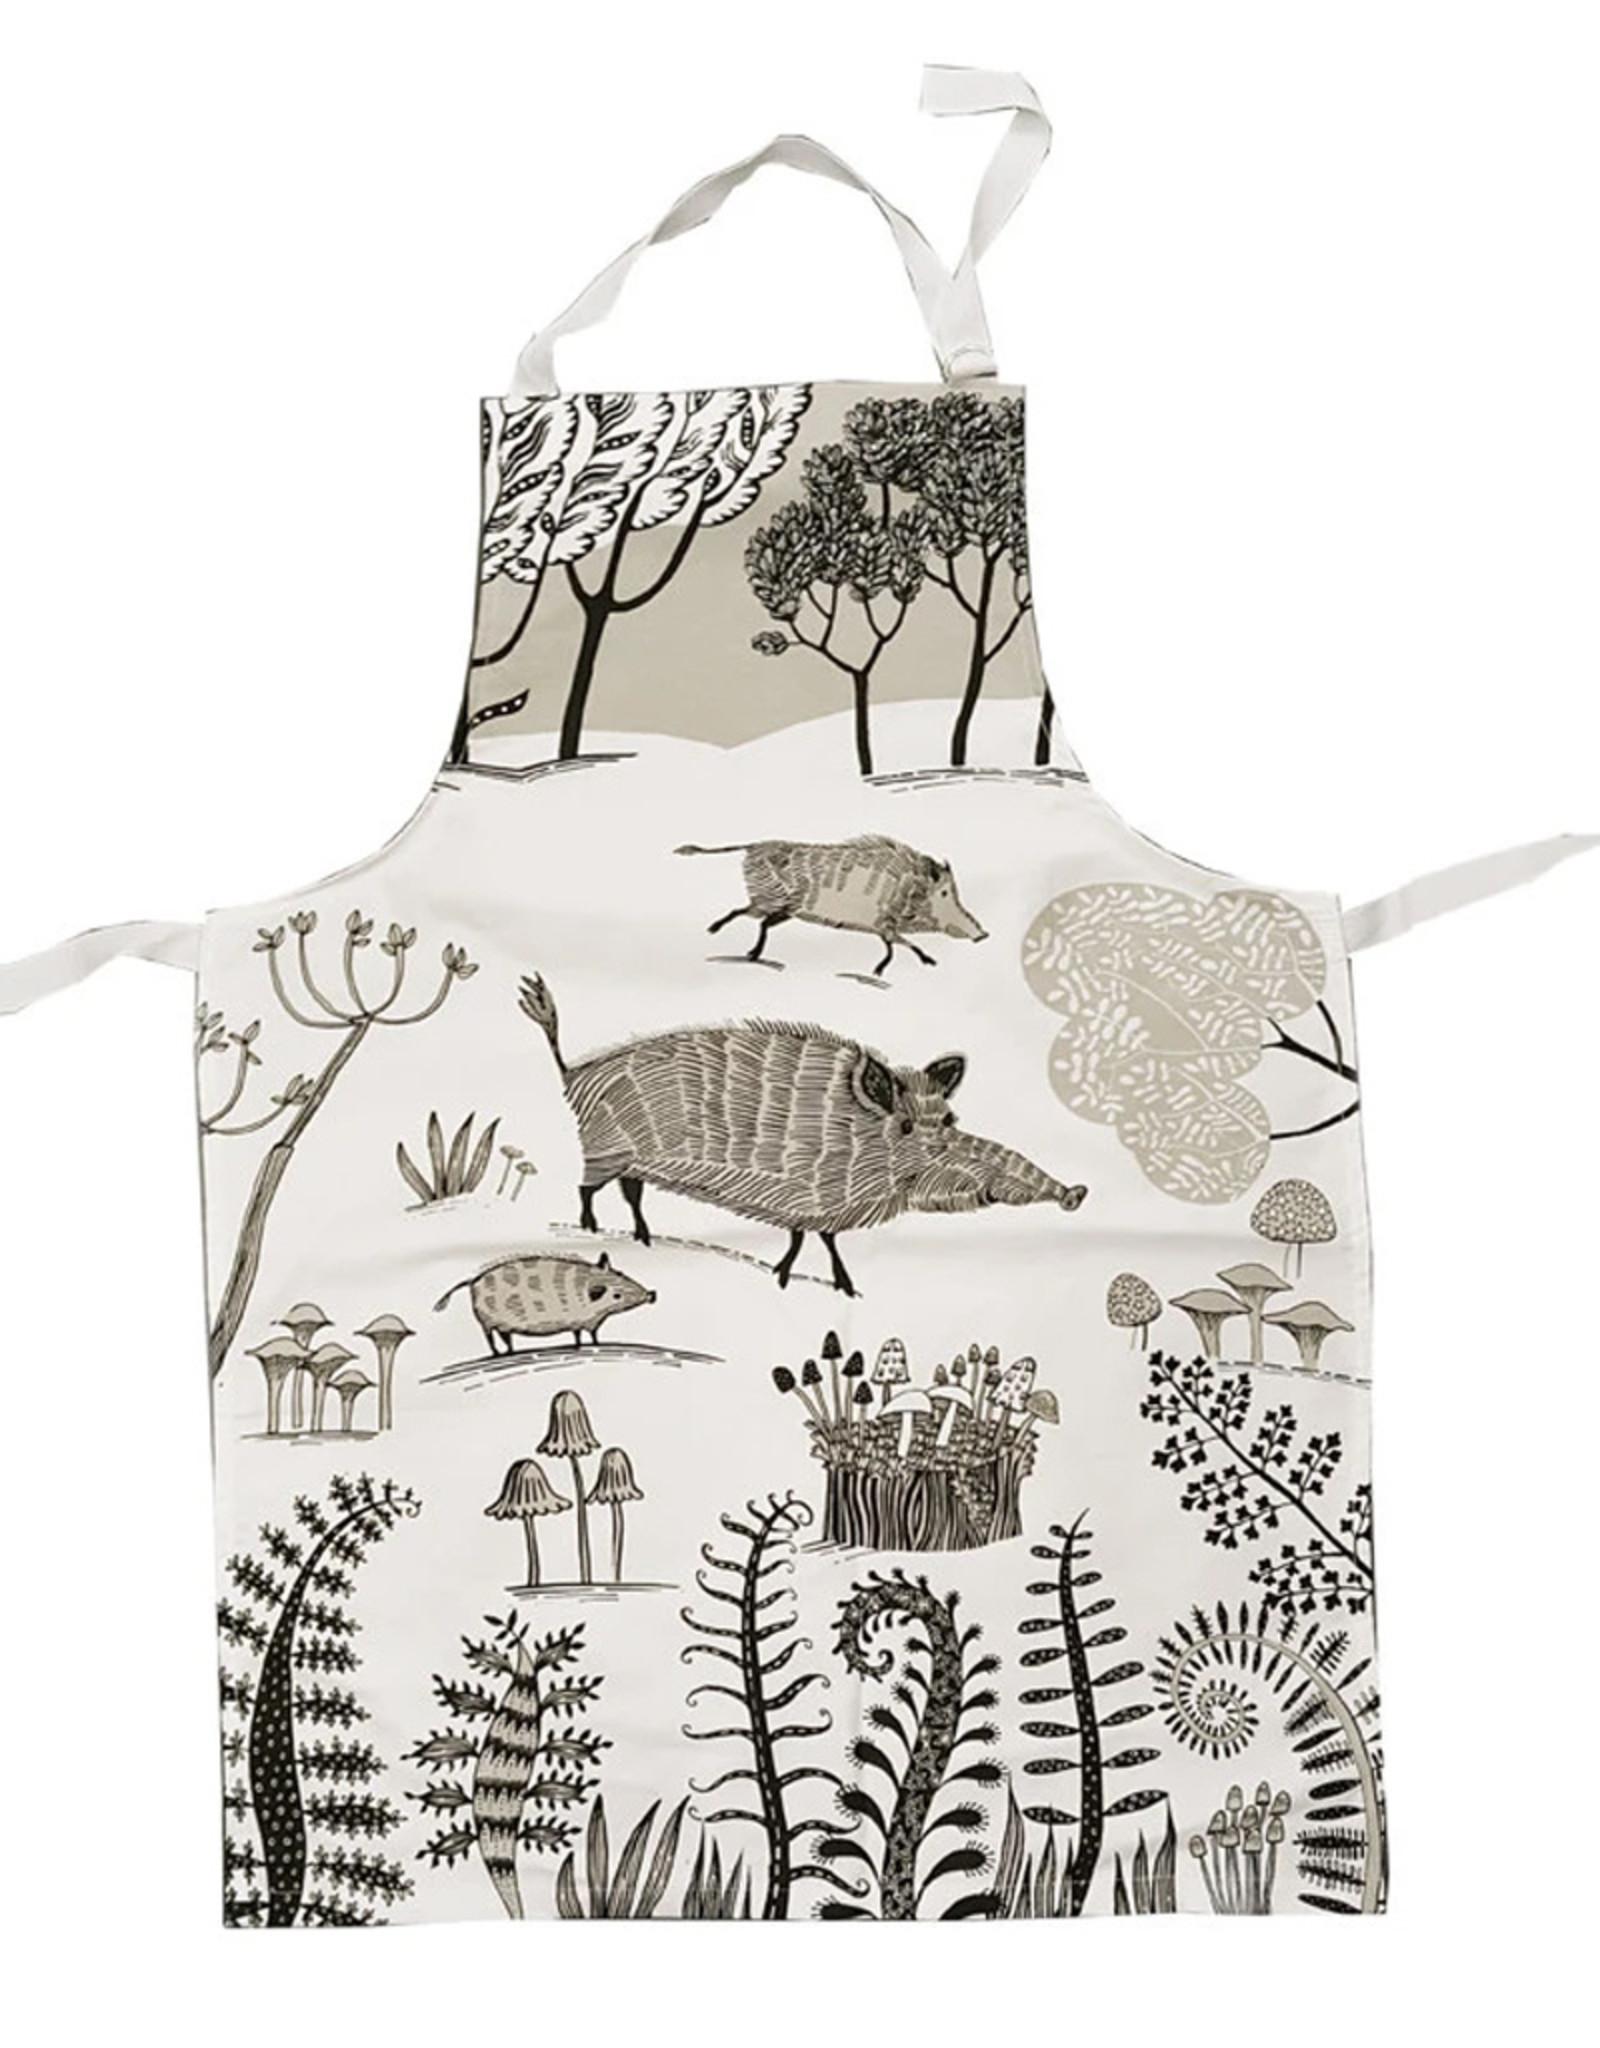 Lush Designs Lush Apron Wild Pig